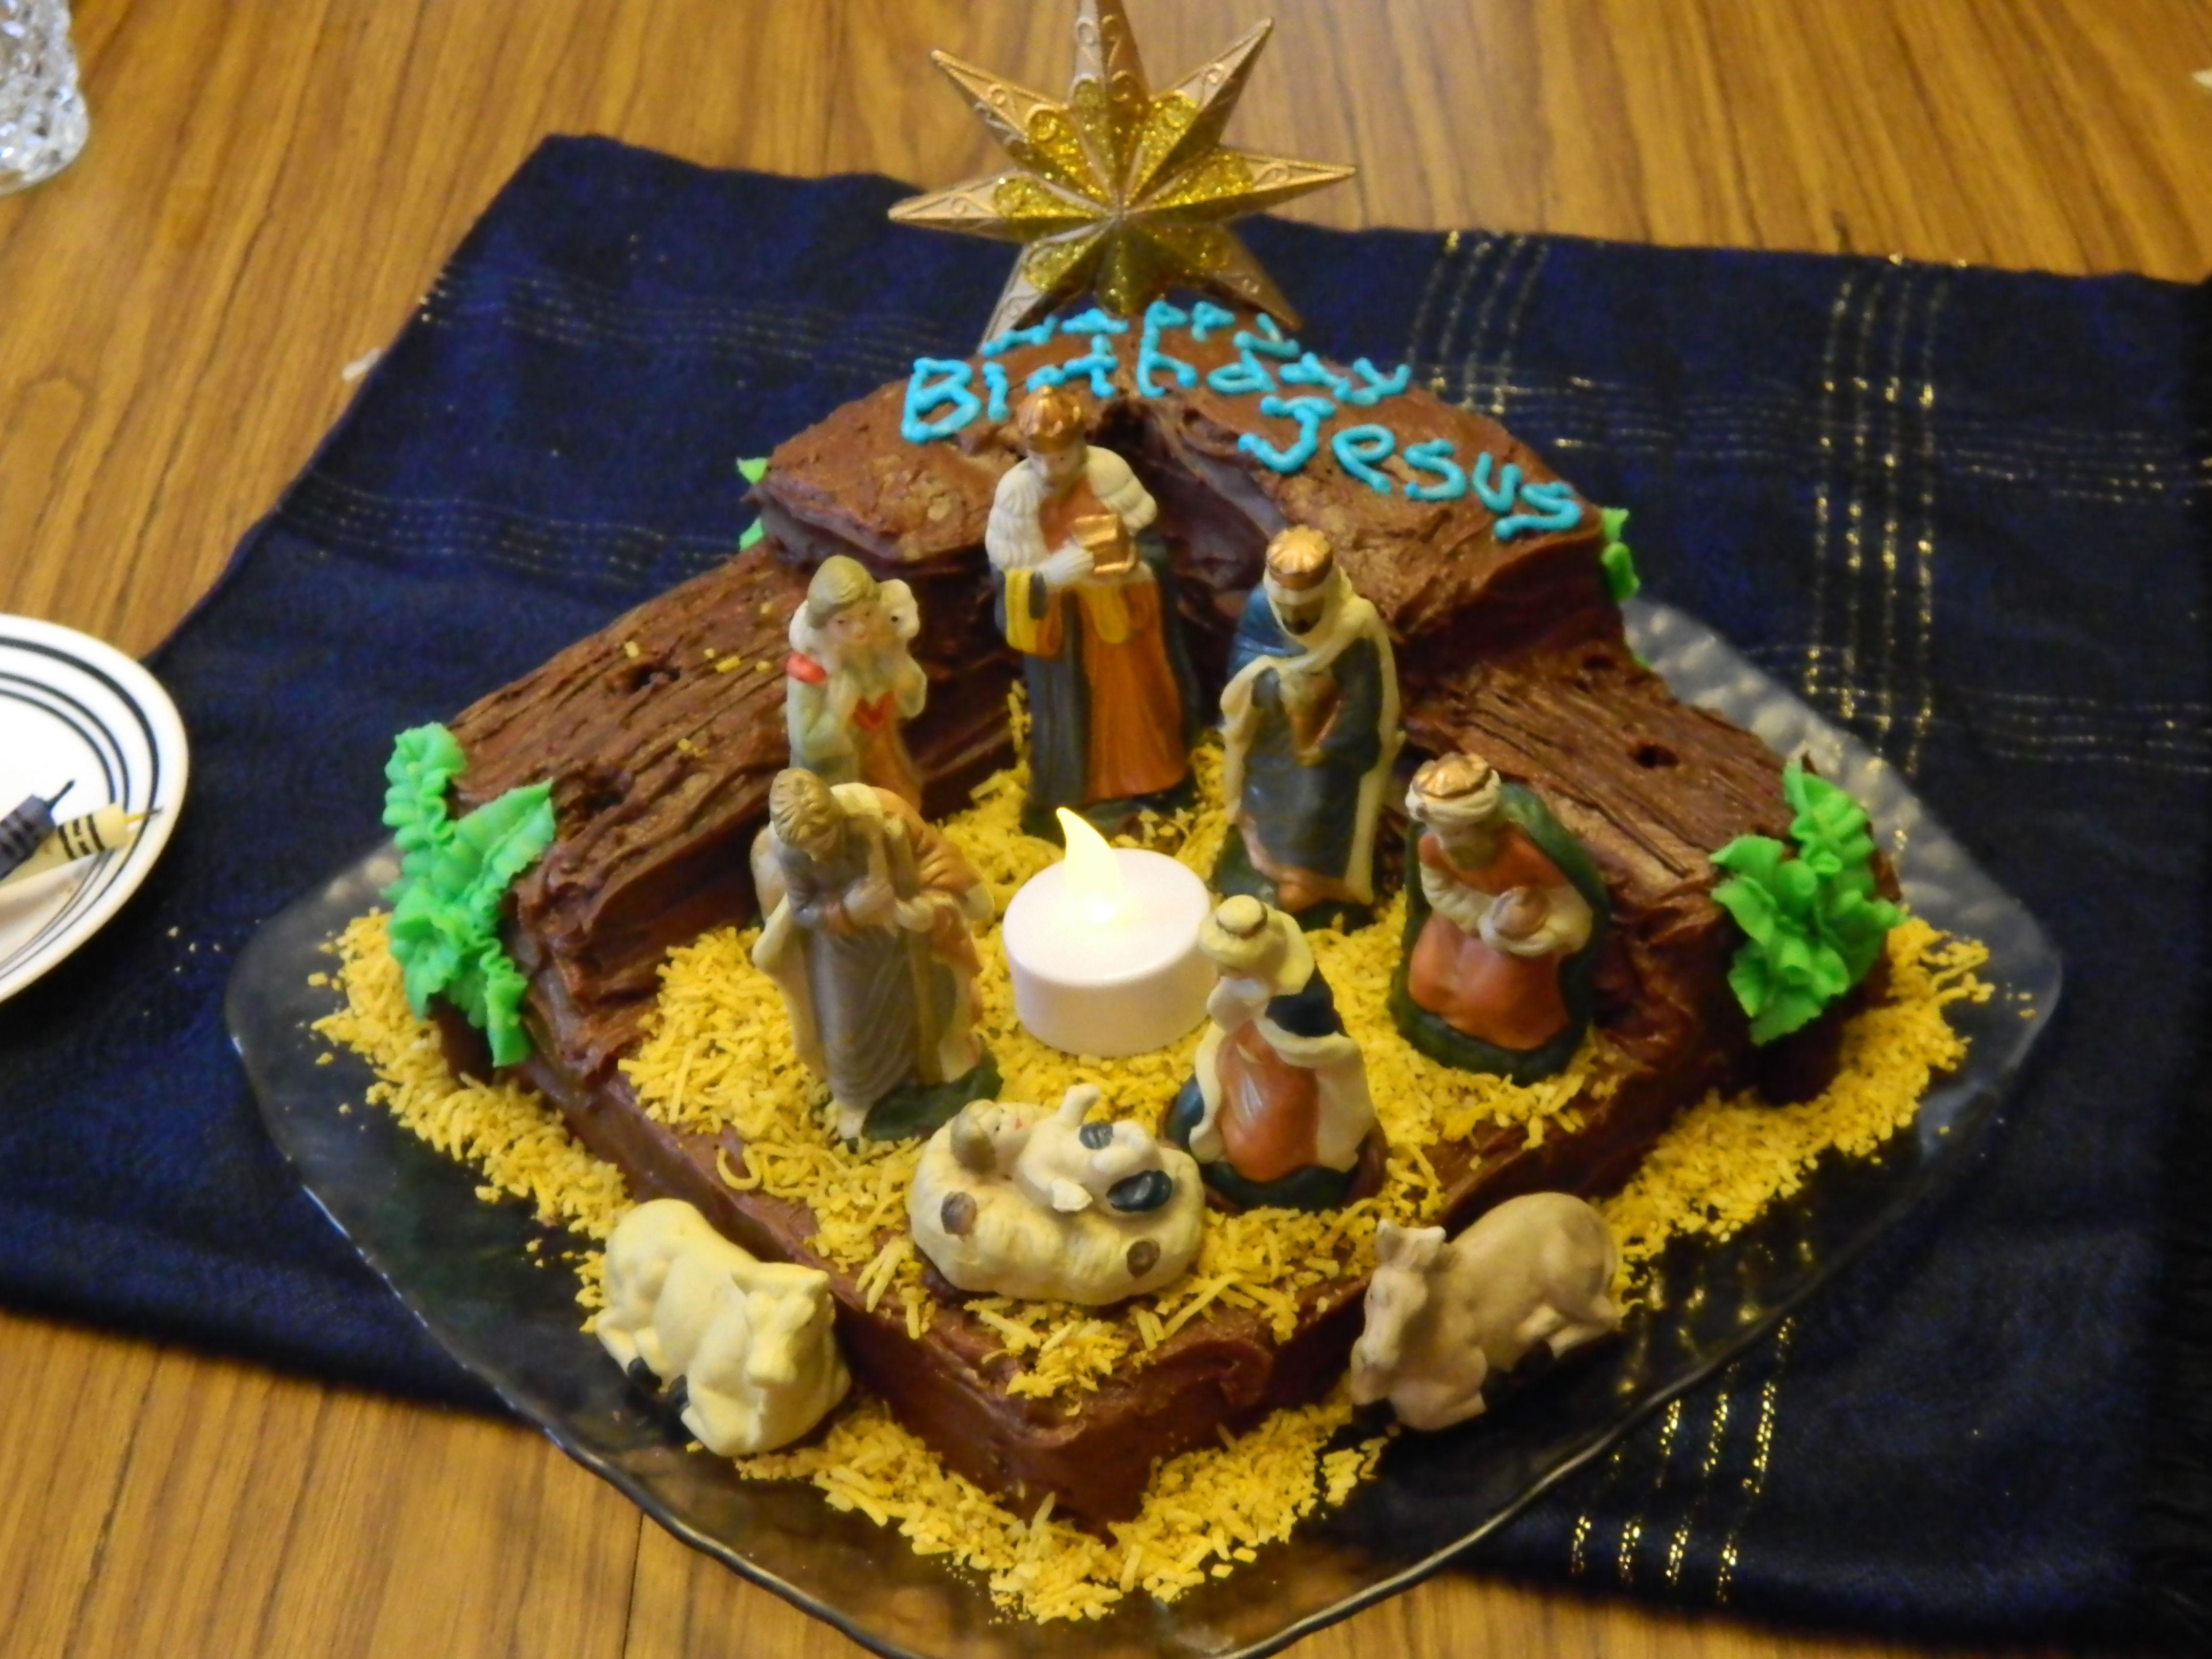 Birthday cake for Jesus Christmas poems, Christmas cake